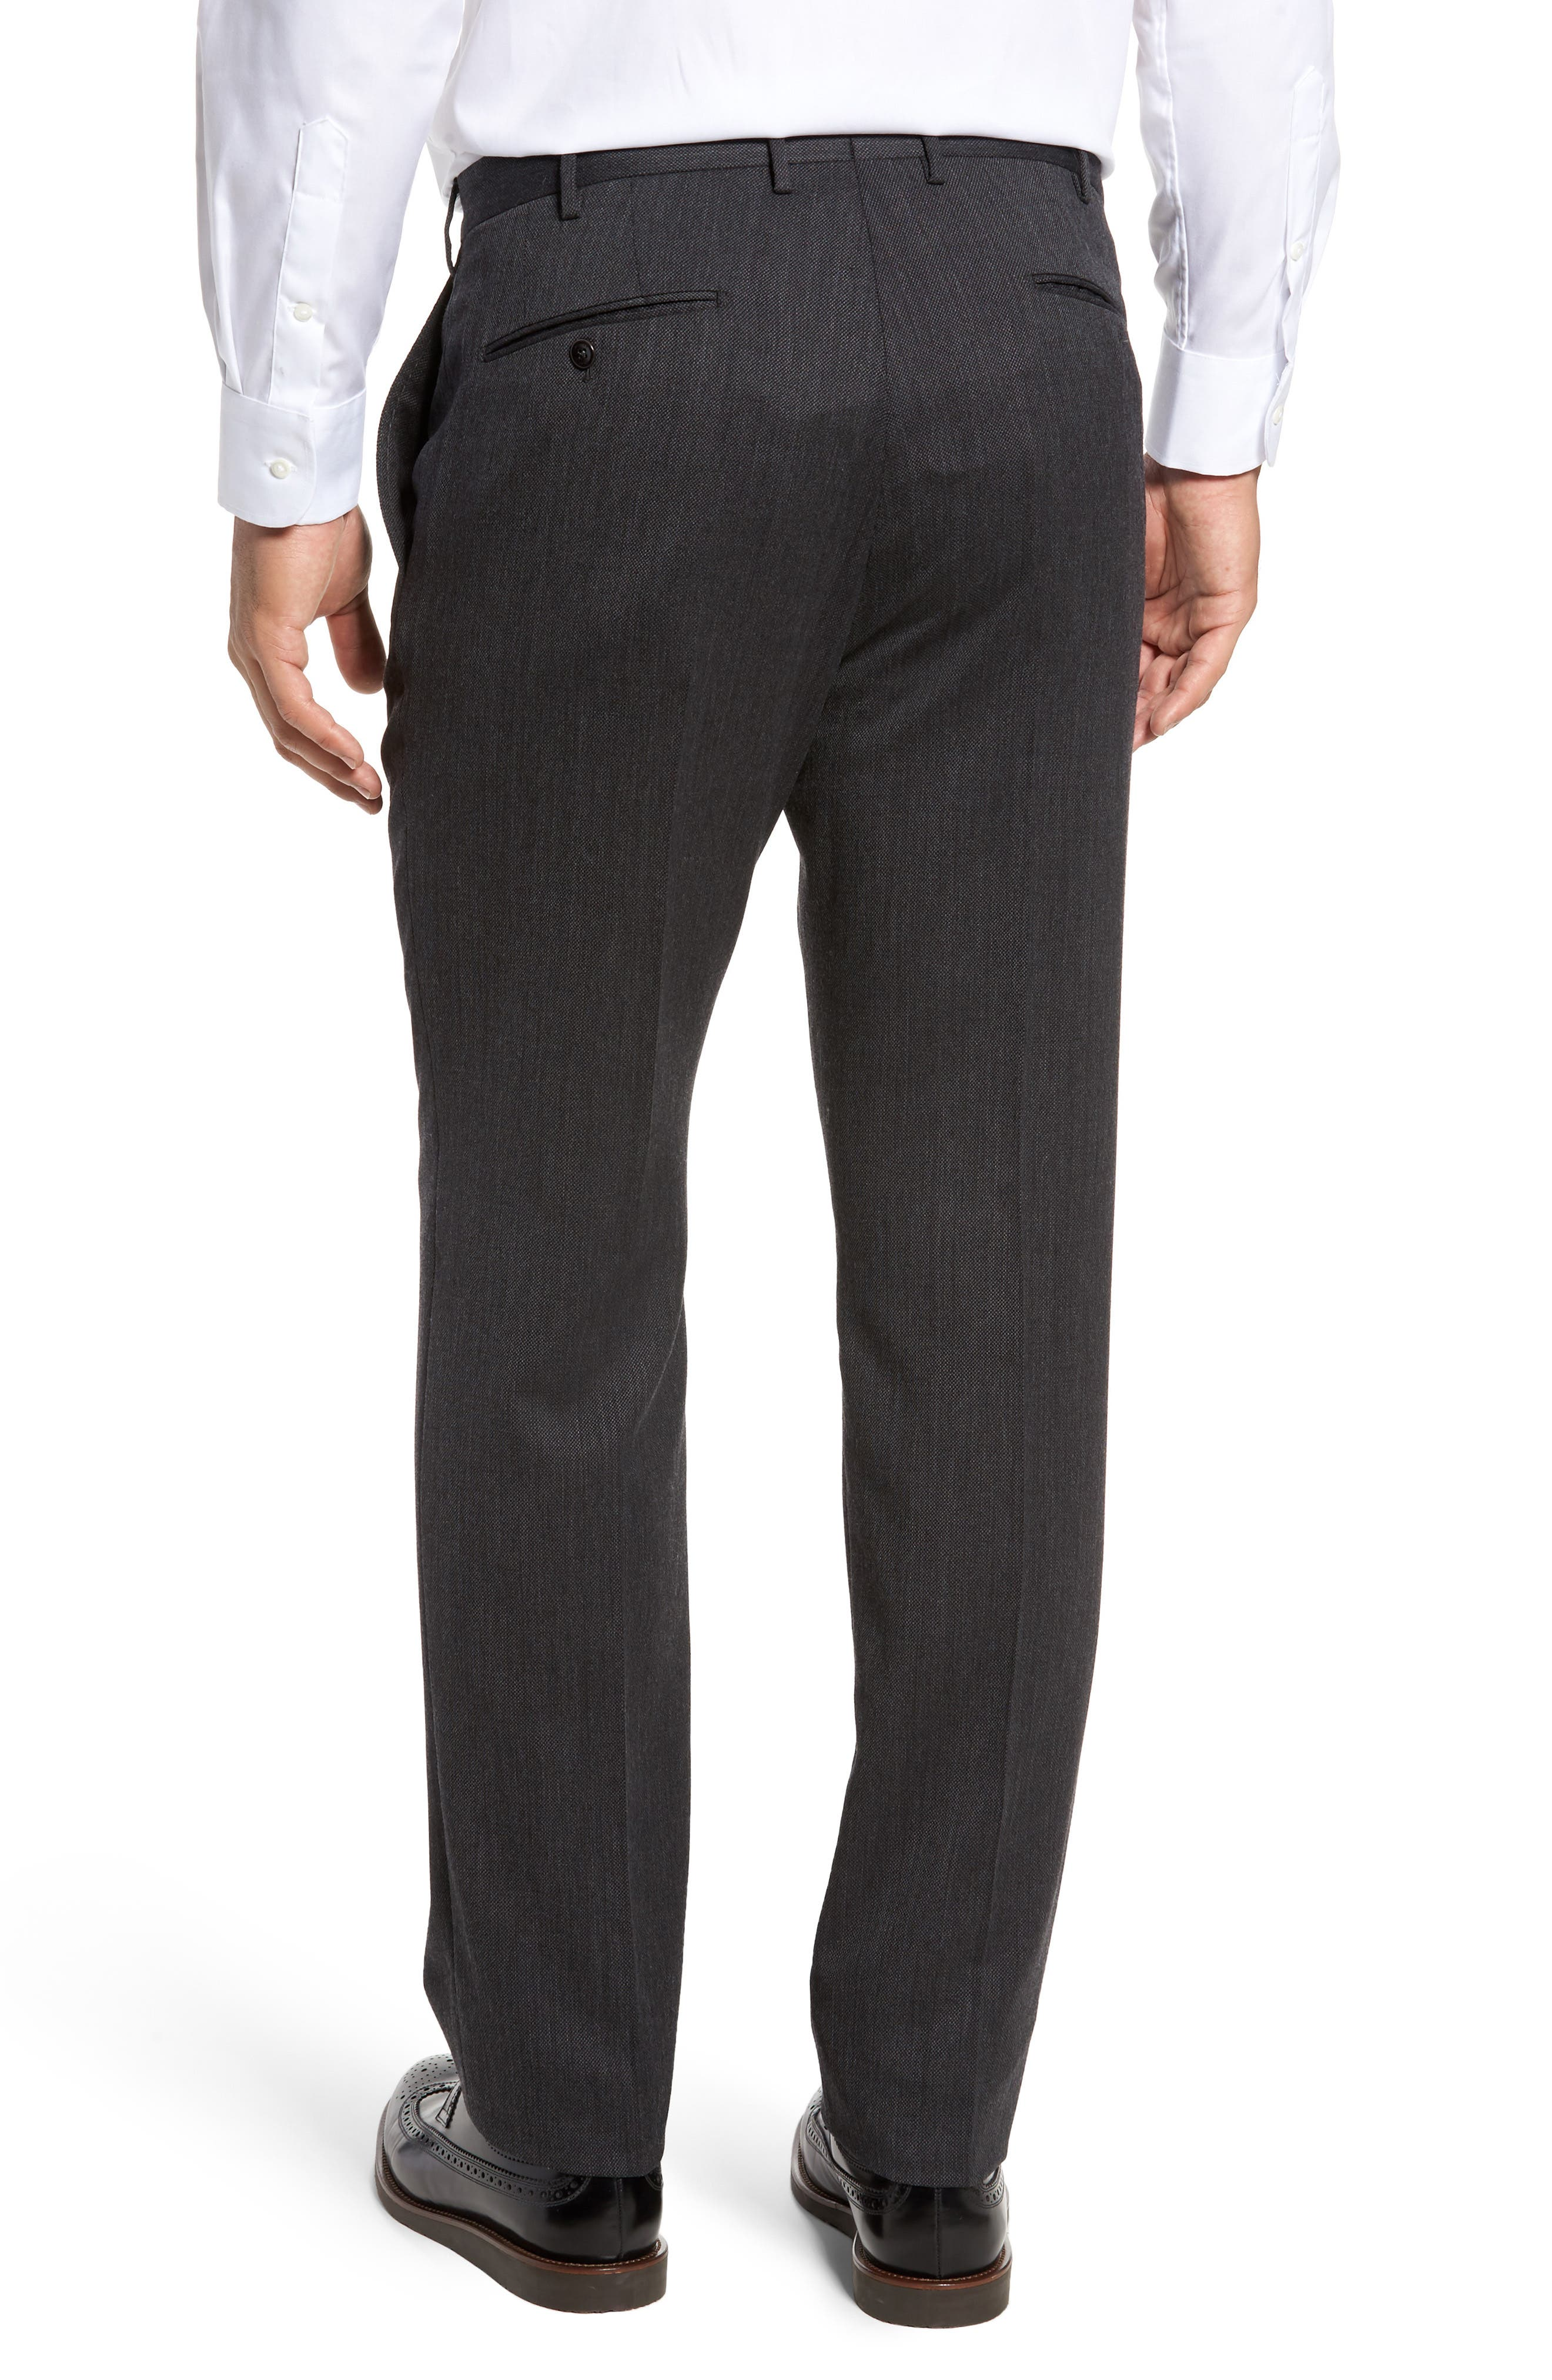 Benson Flat Front Wool Blend Trousers,                             Alternate thumbnail 3, color,                             Dark Grey